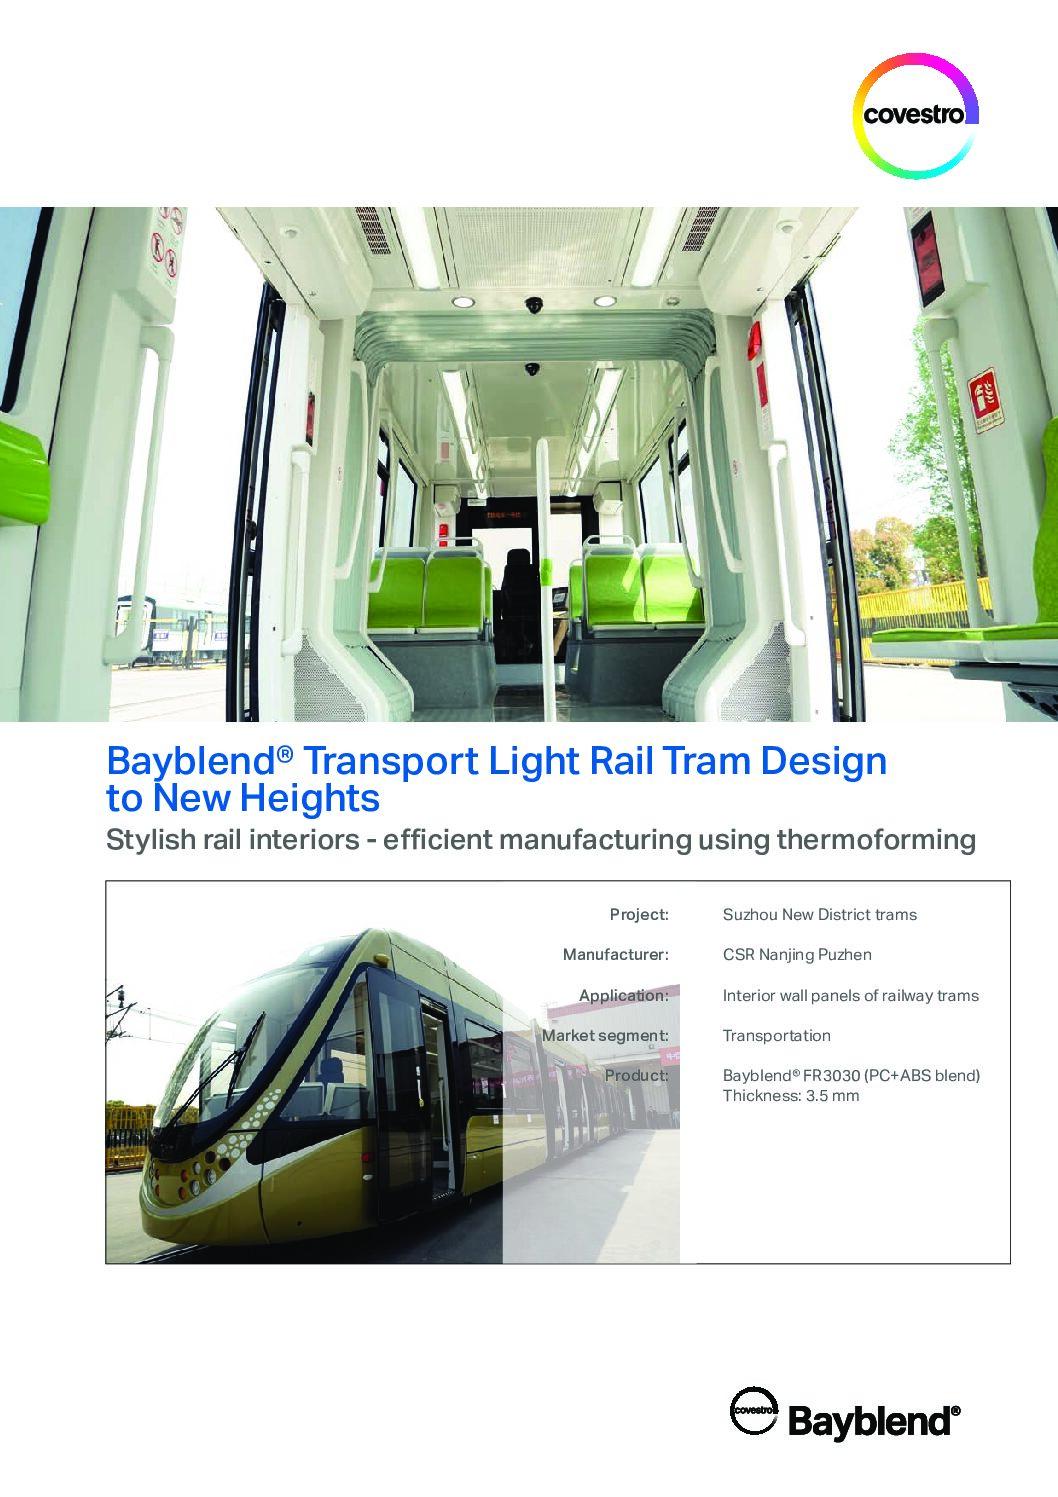 Bayblend Transport Light Rail Tram